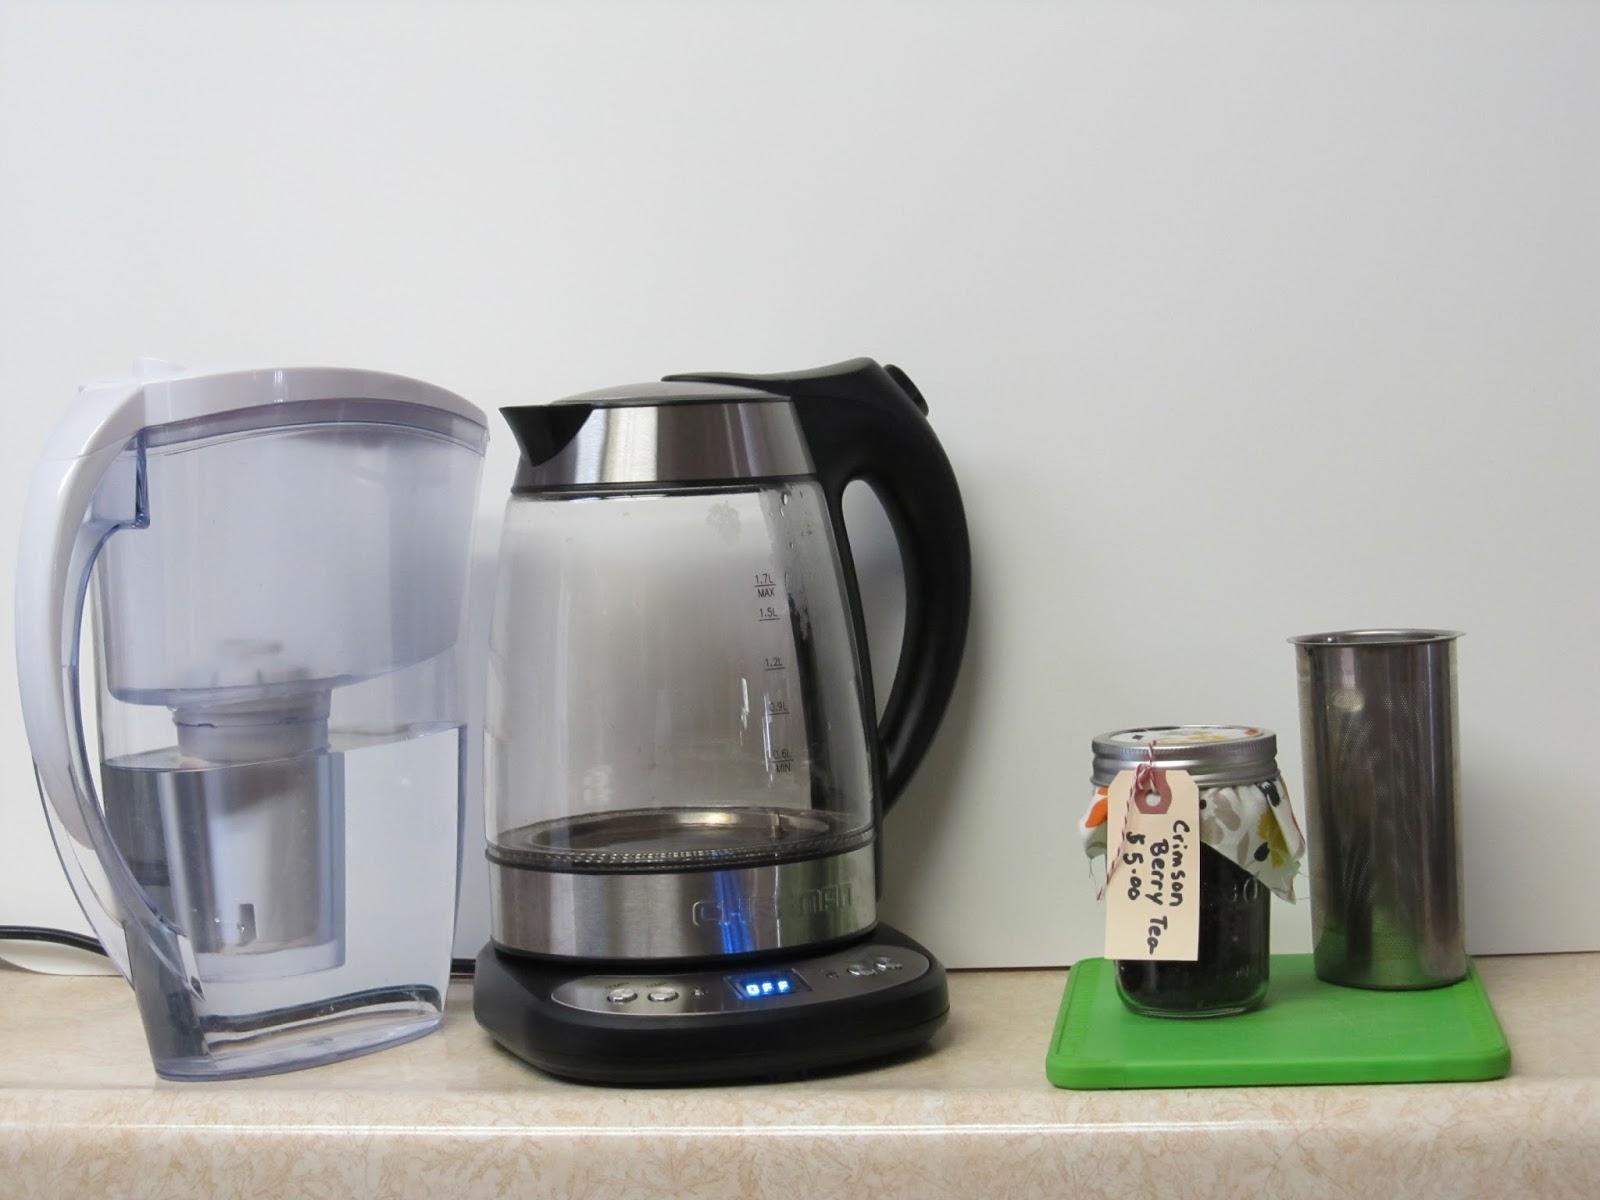 chefman precision electric kettle manual